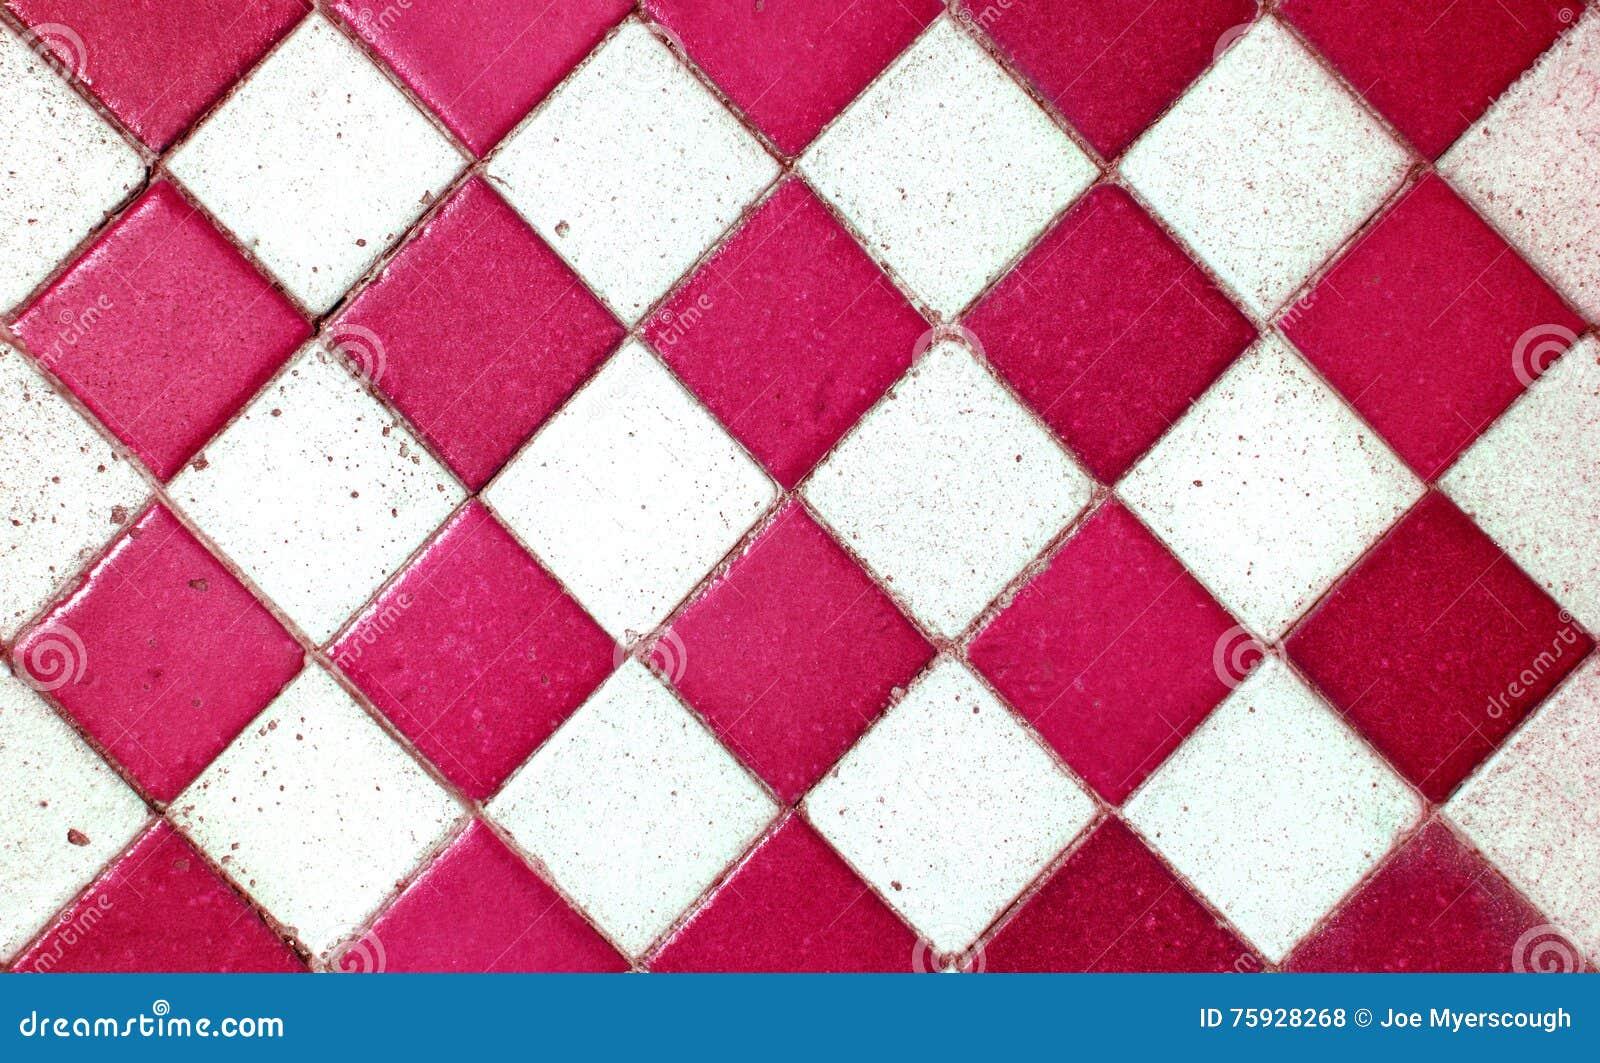 rote alte muster quadrat fliesen beschaffenheit boden. Black Bedroom Furniture Sets. Home Design Ideas